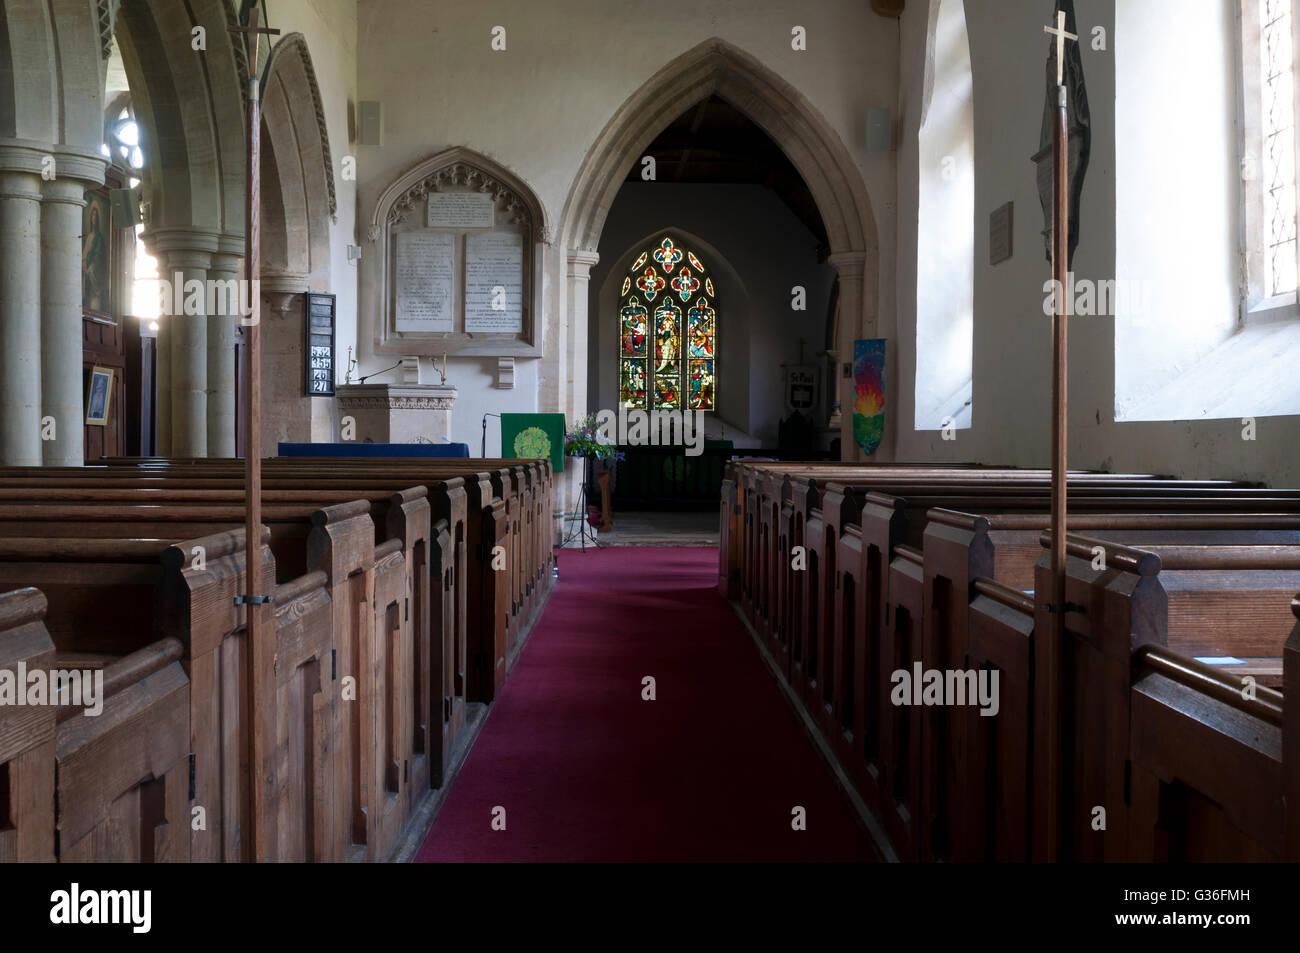 St. Peter and St. Paul Church, Cosgrove, Northamptonshire, England, UK - Stock Image